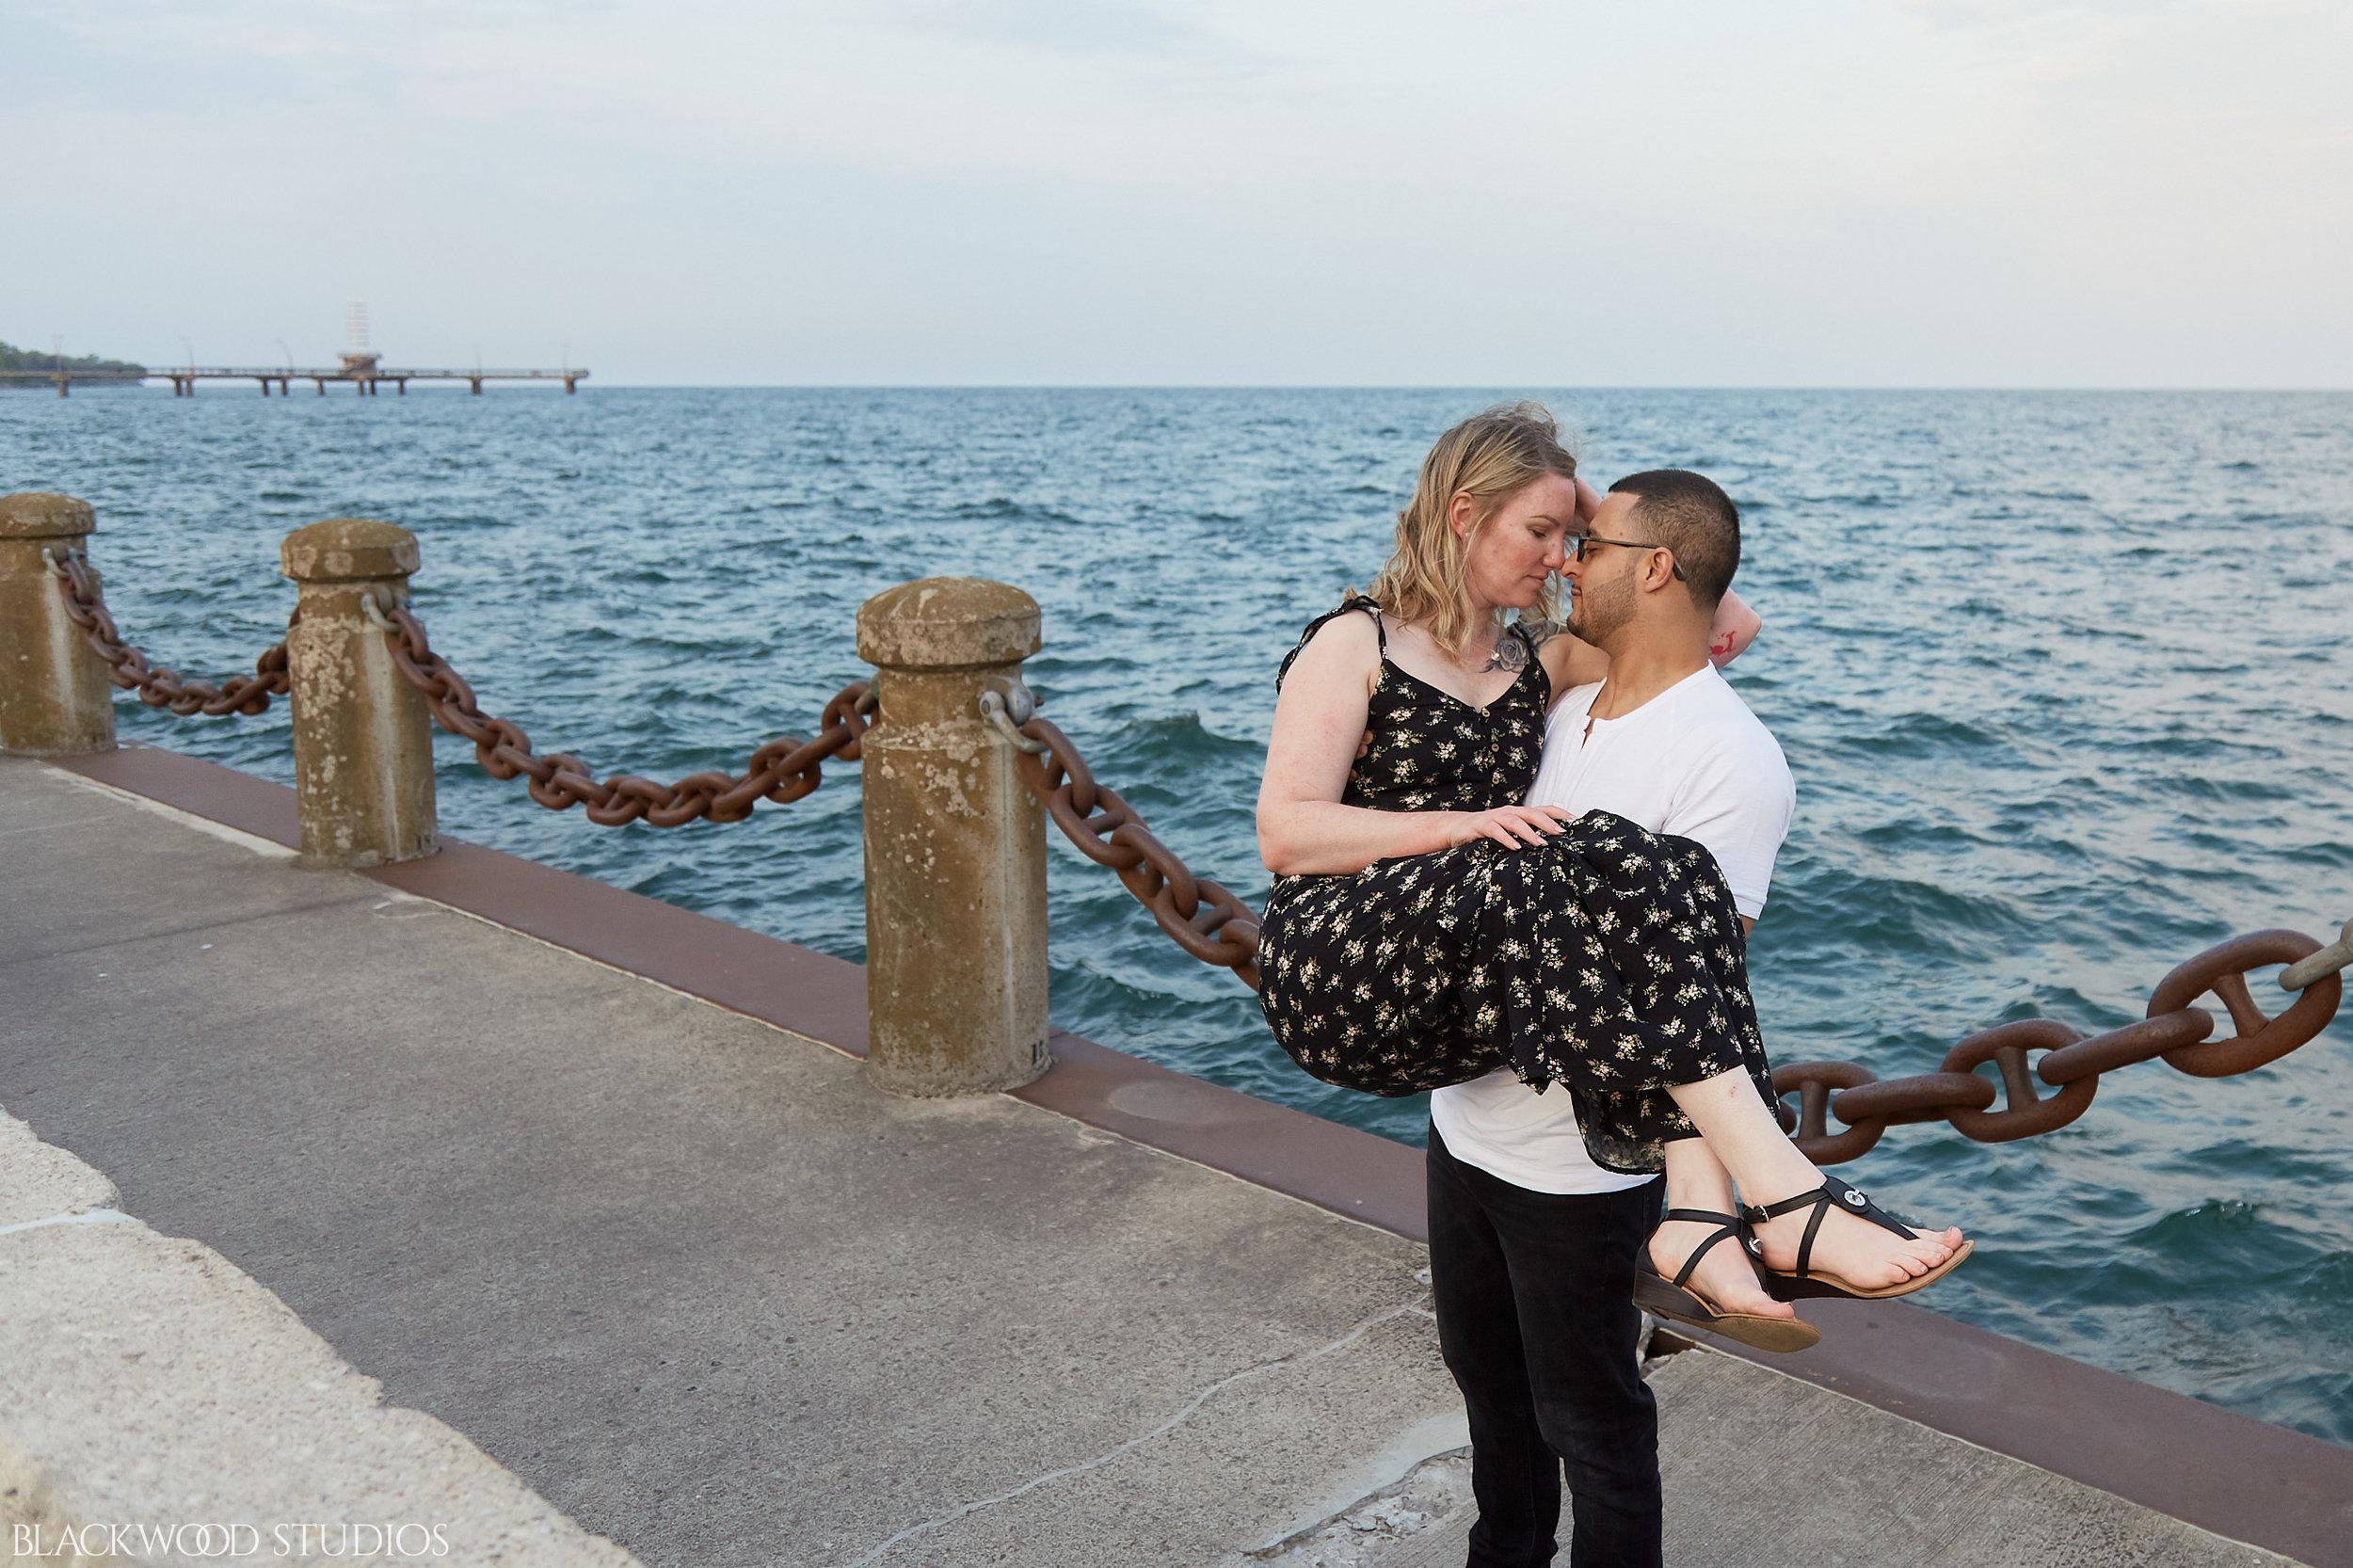 Blackwood-Studios-Photography-20190604201940-Shannon-and-Pedro-Engagement-Spencer-Smith-Park-Burlington-Ontario-Canada.jpg